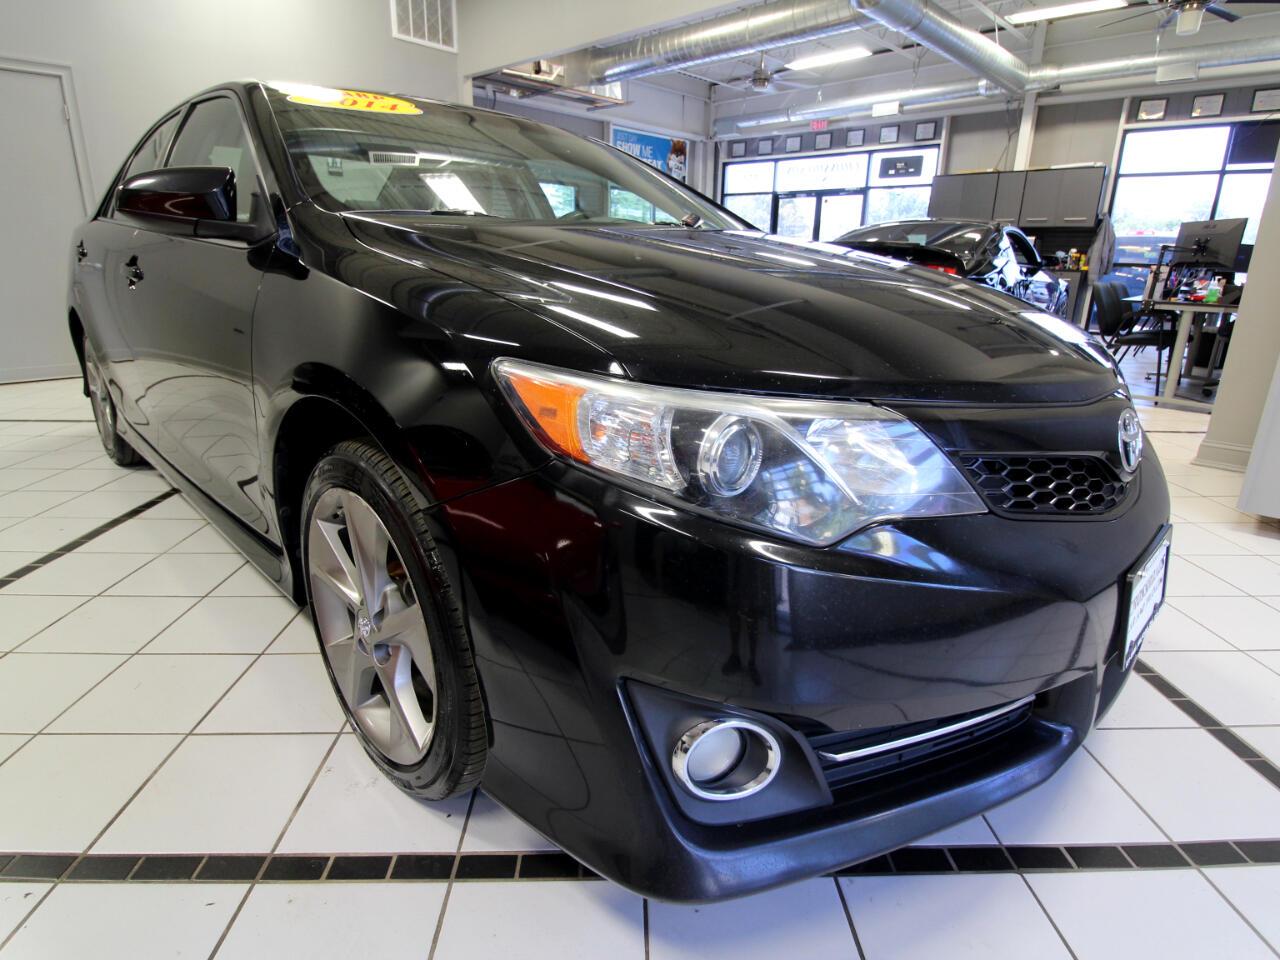 Toyota Camry 4dr Sdn V6 Auto SE (Natl) *Ltd Avail* 2014